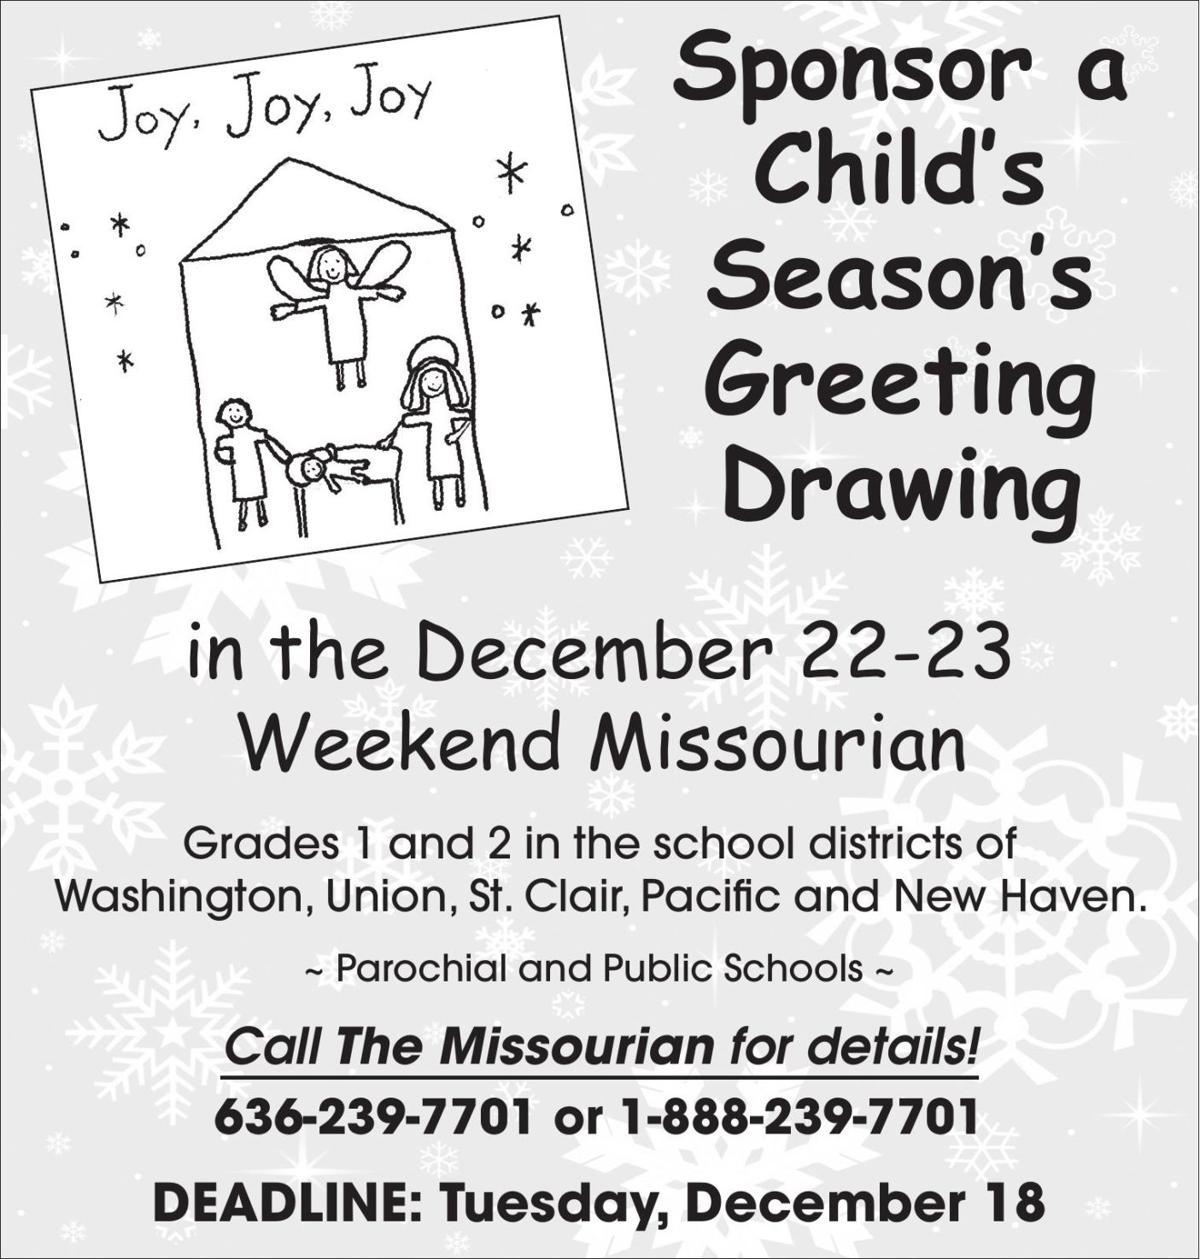 Sponsor a Child's Season's Greeting Drawing